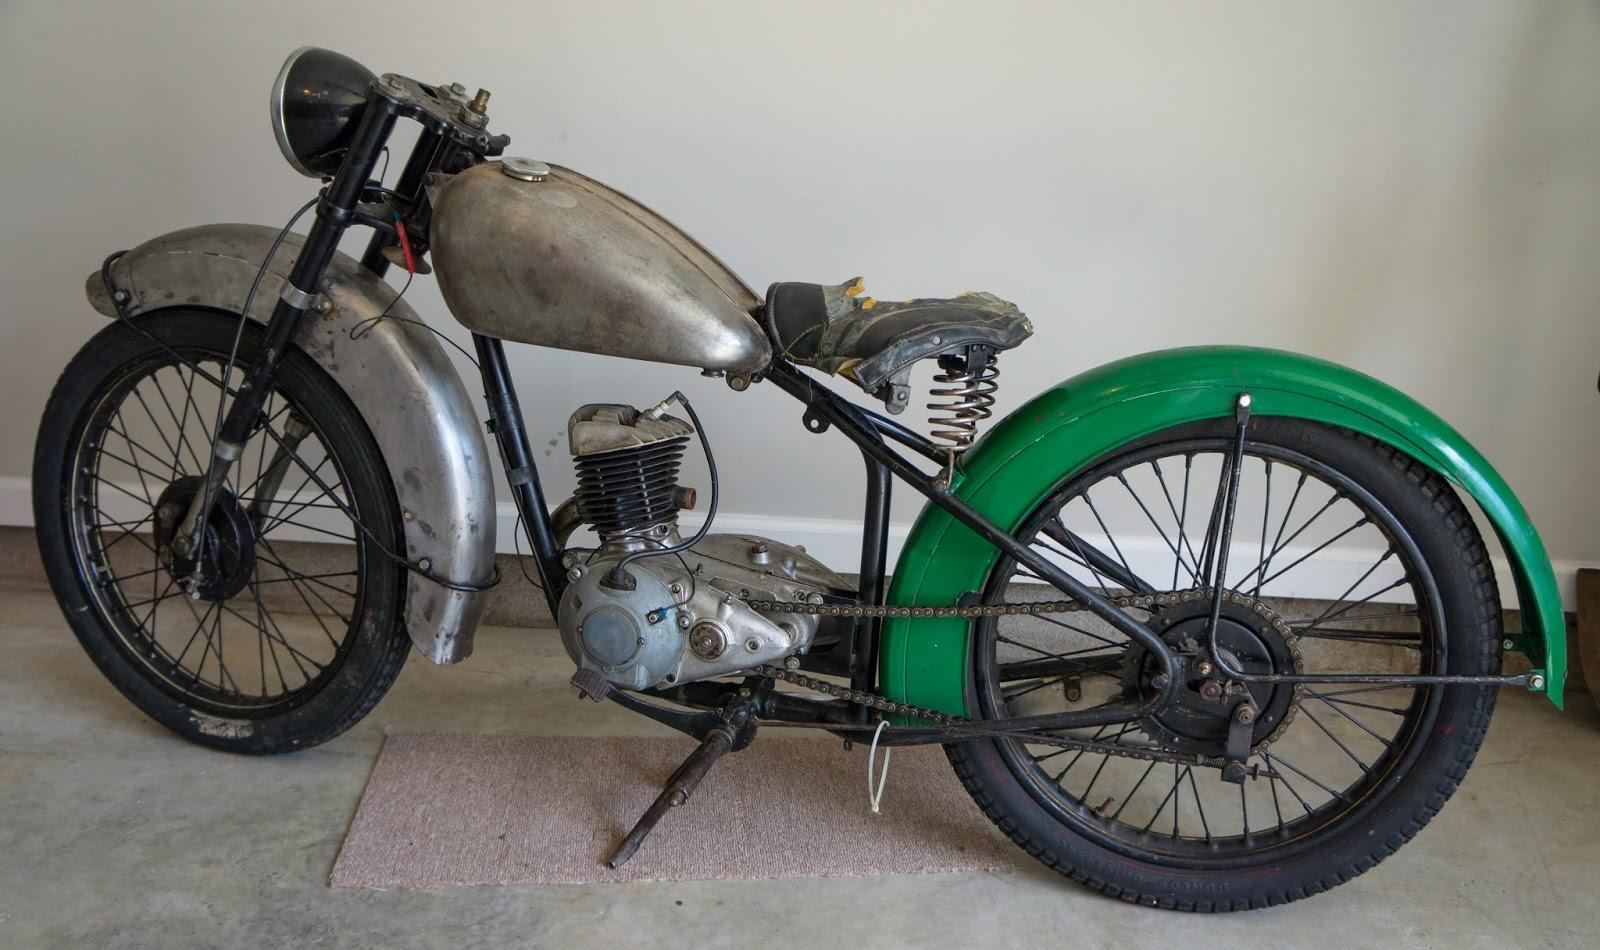 BSA BANTAM MOTORCYCLES I HAVE OWNED: 1949 BSA BANTAM D1